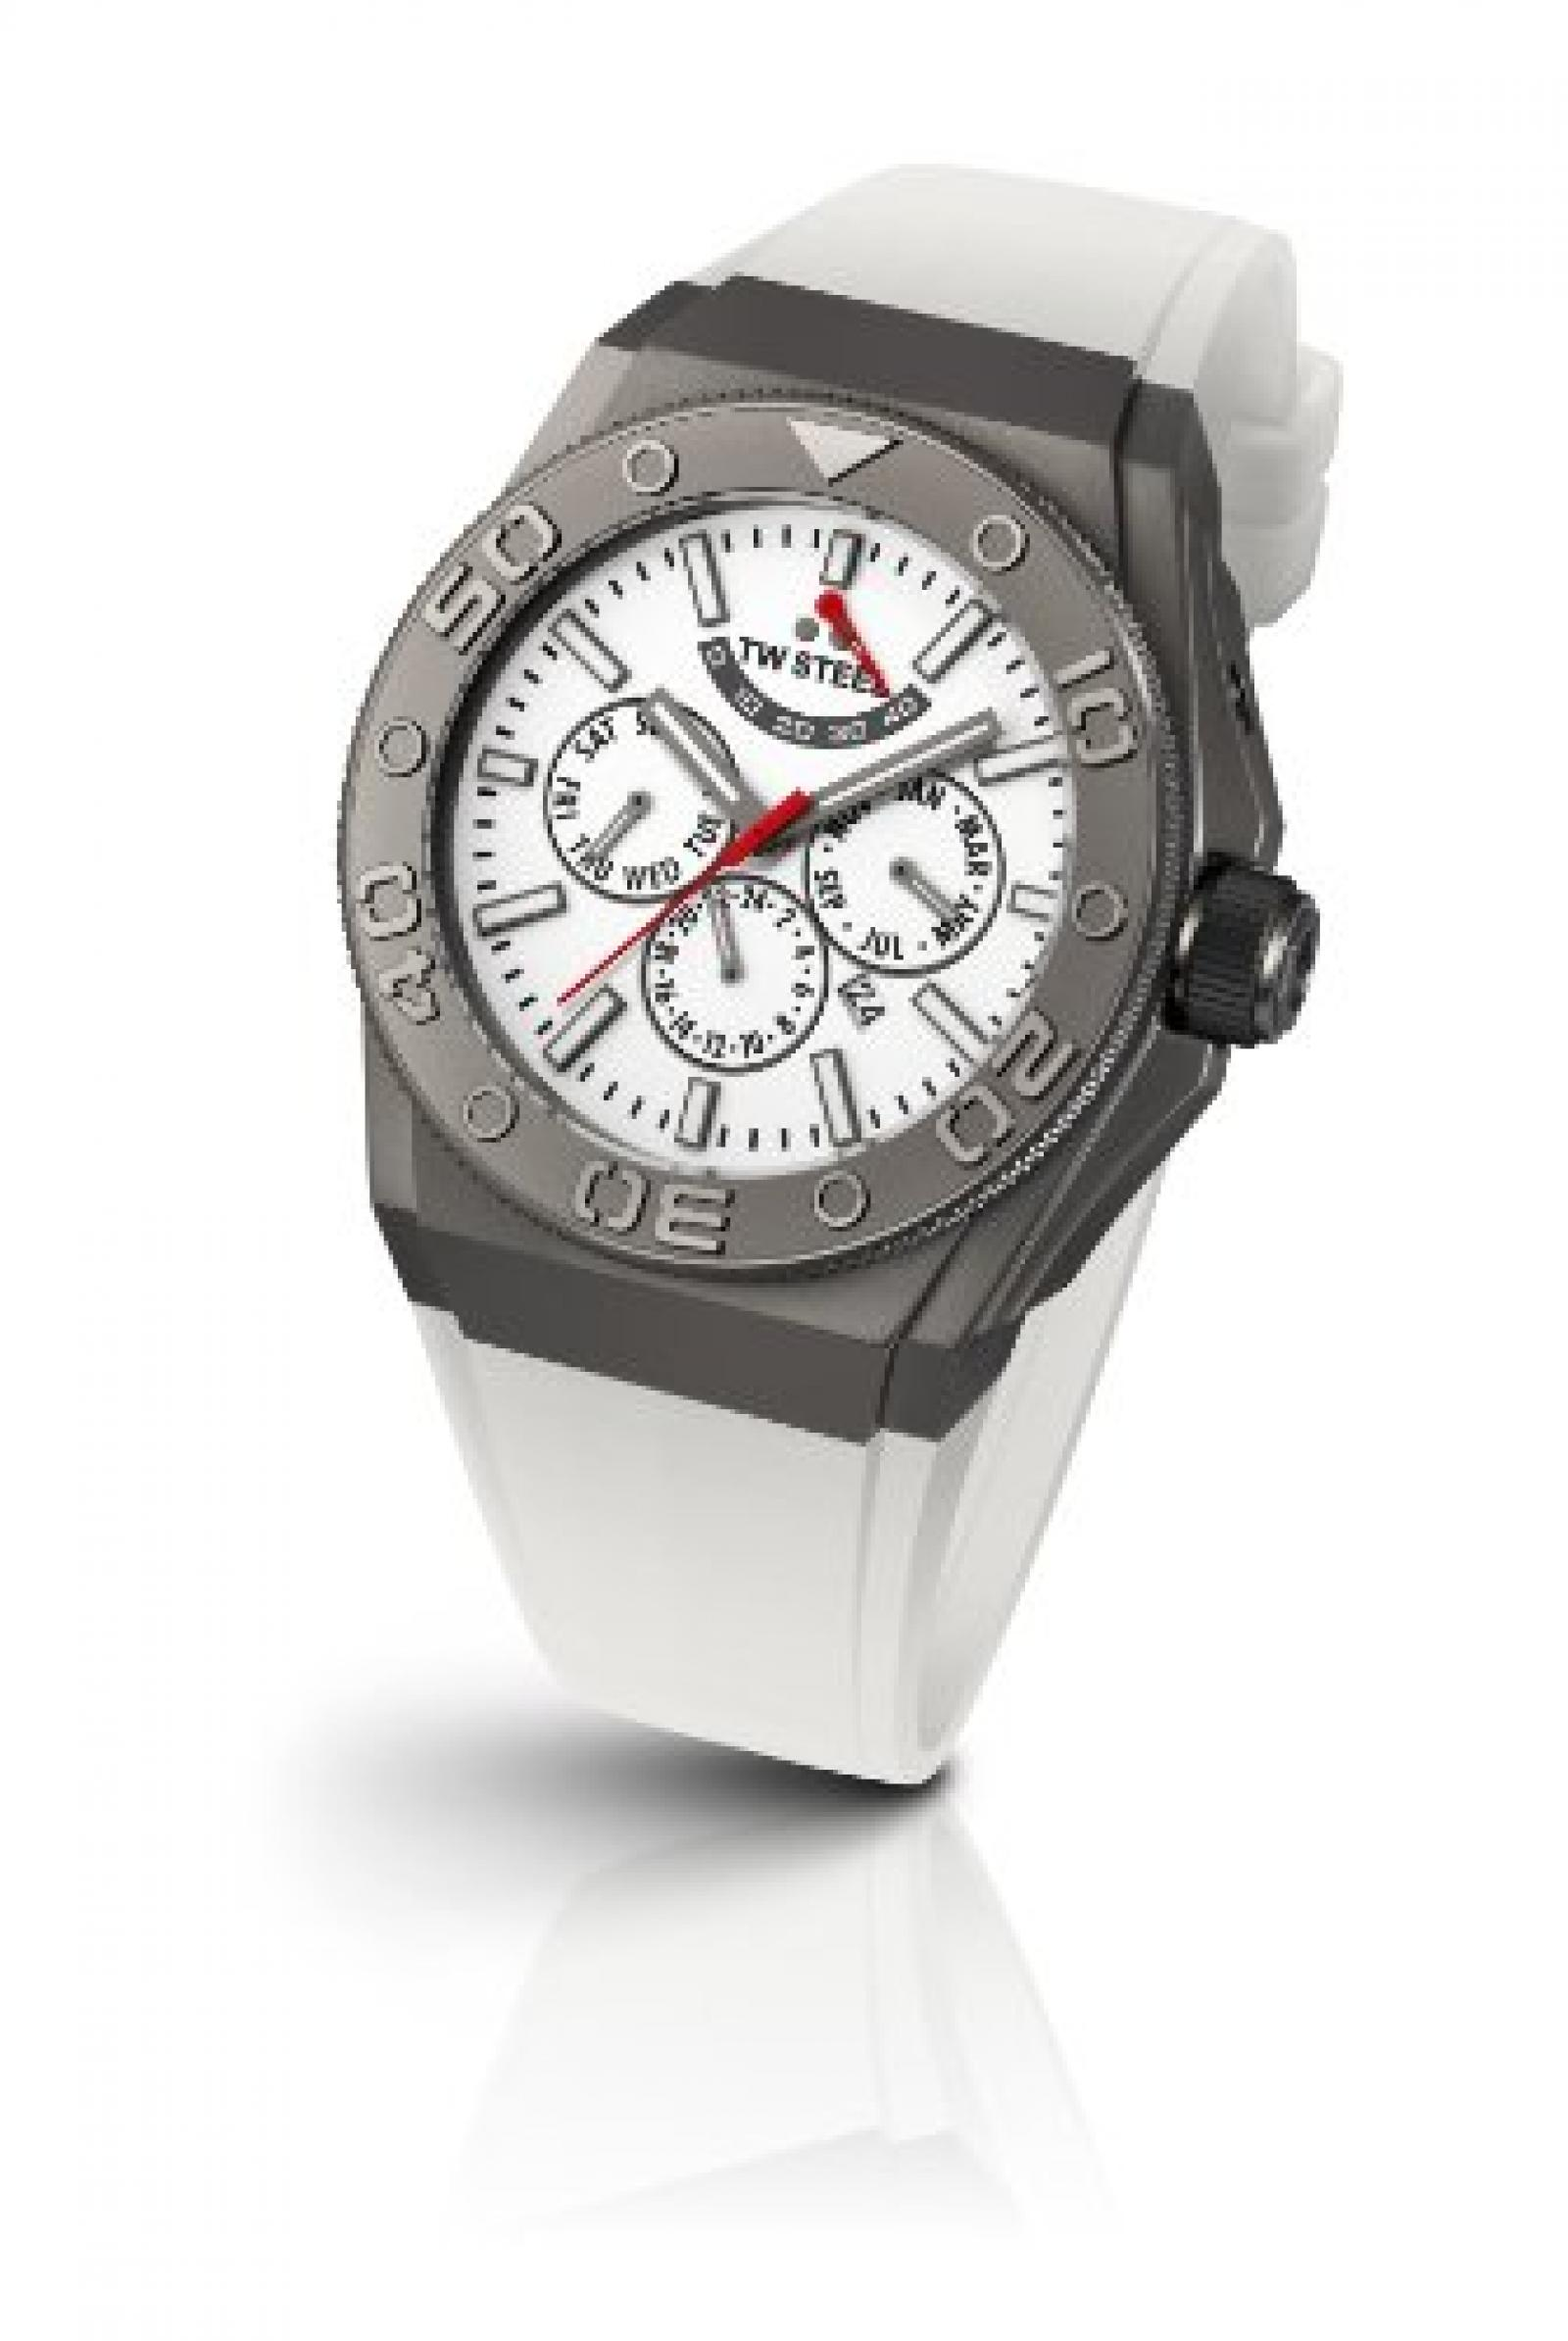 TW Steel Unisex-Armbanduhr CEO DIVER Chronograph automatik silikon weiss CE5003